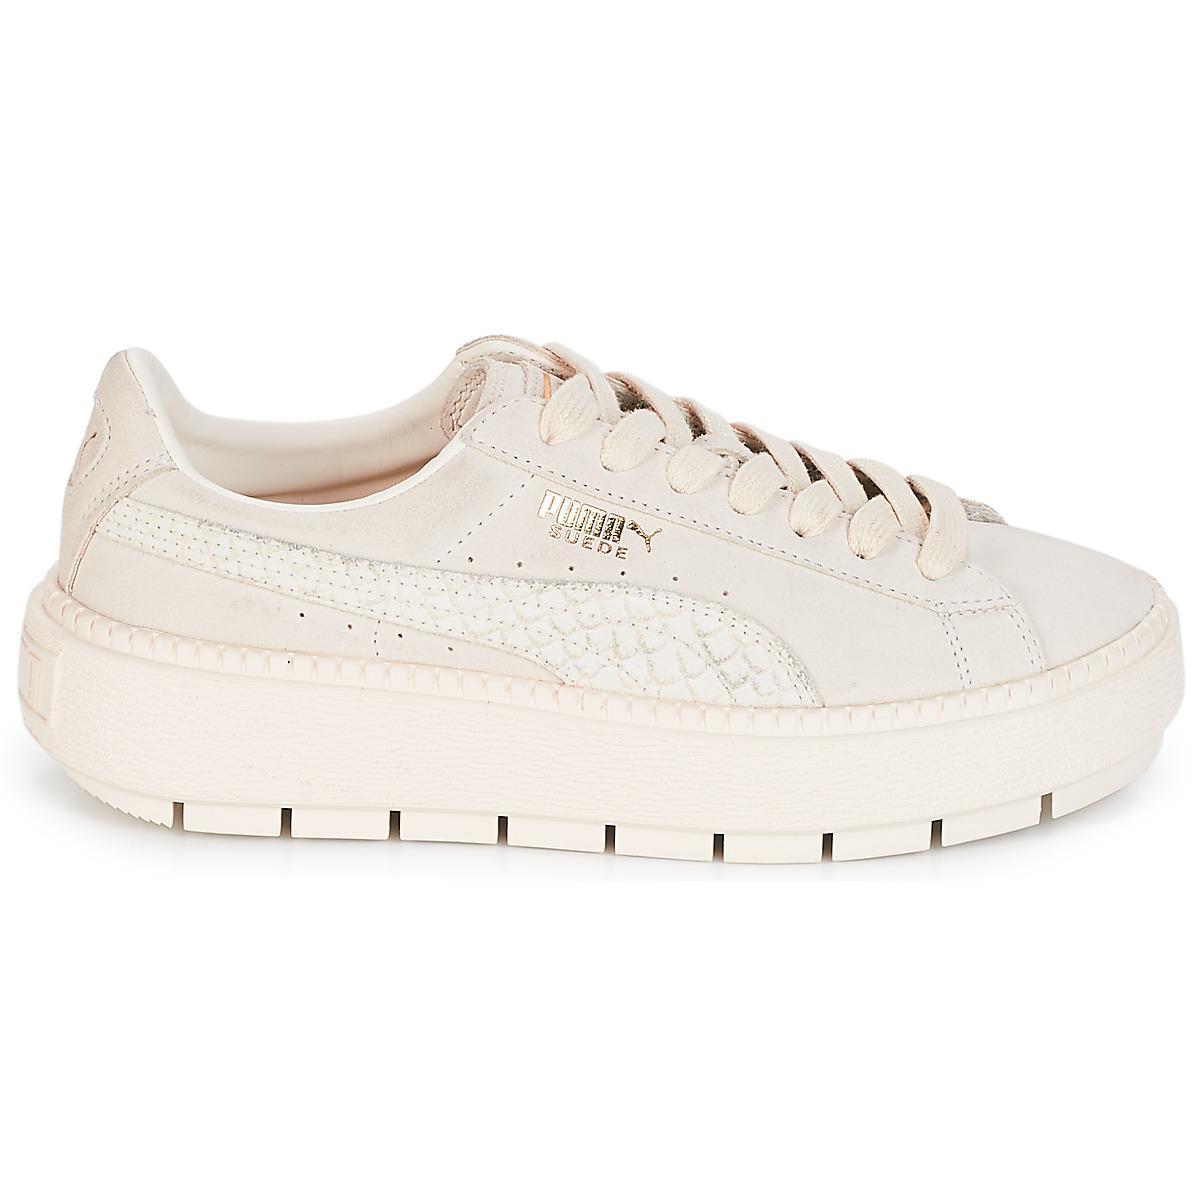 7f0ddf4b6d5a PUMA - Wn Platform Trace Animal.w Women s Shoes (trainers) In White -. View  fullscreen